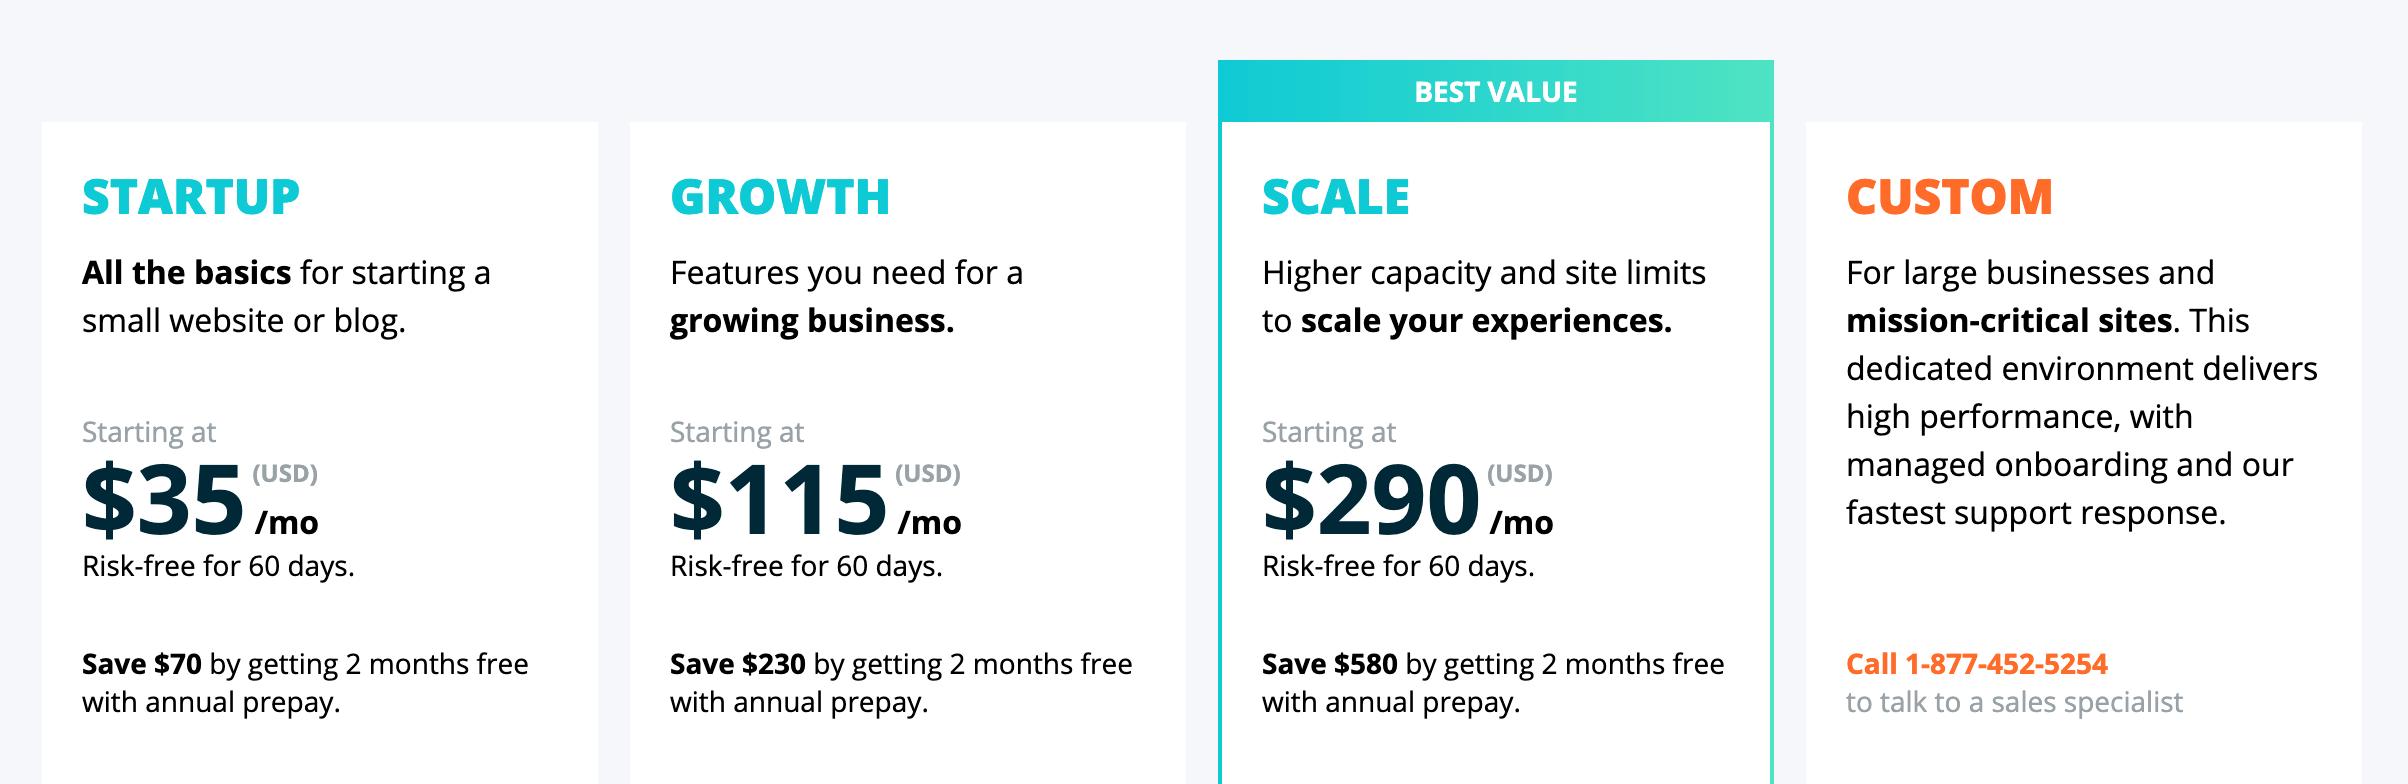 WP Engine pricing vs SiteGround